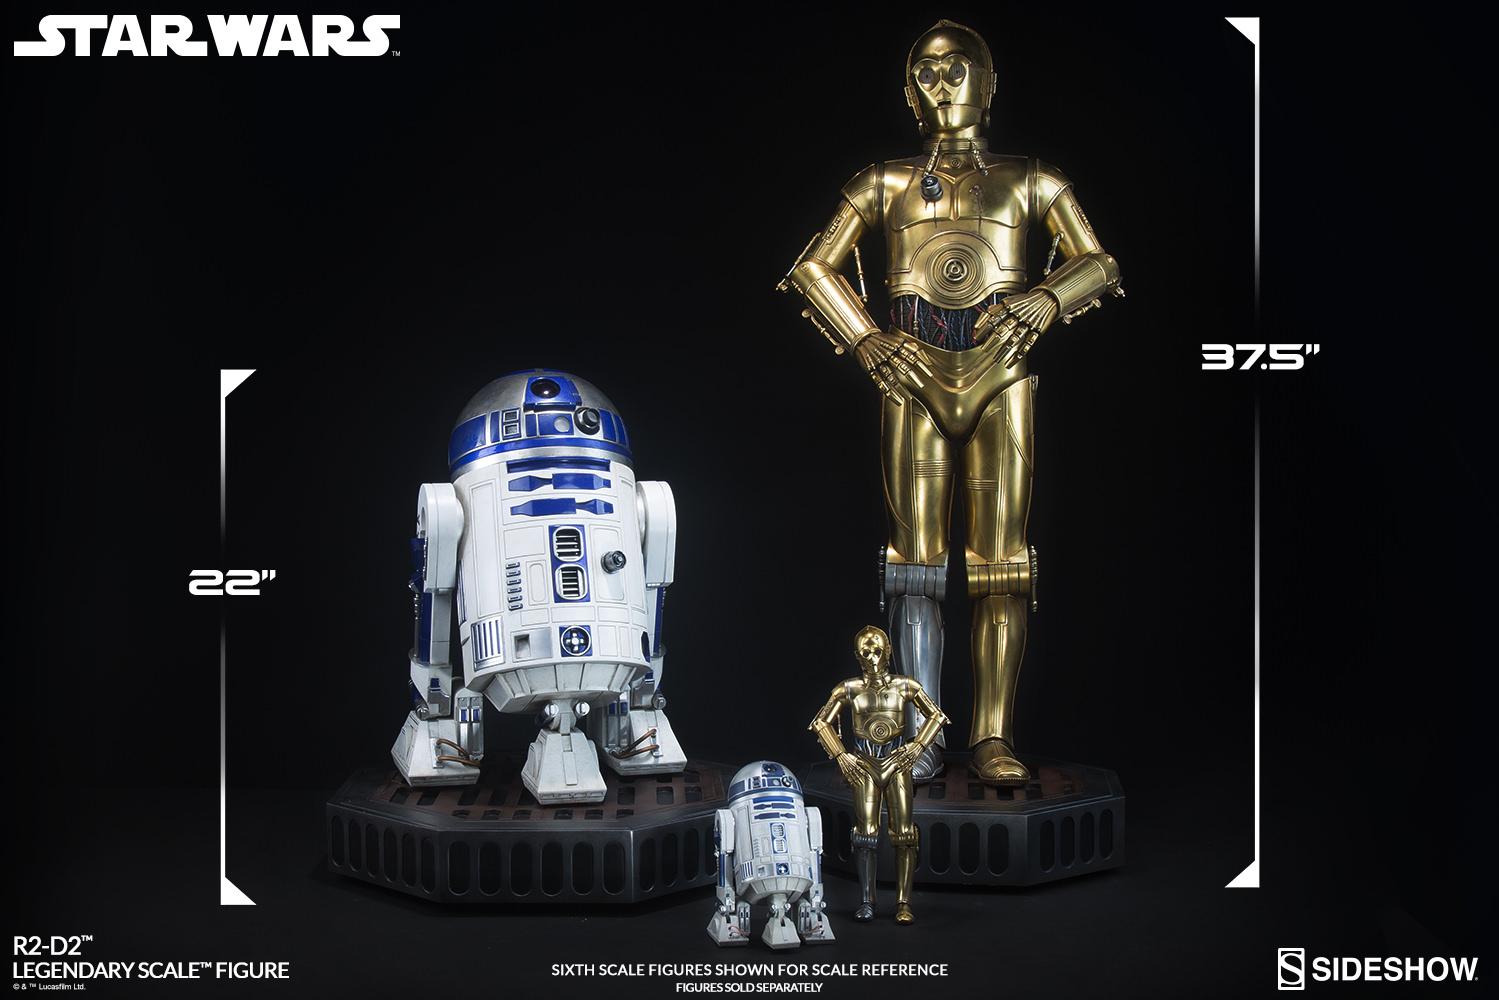 Sideshow R2-D2 Legendary Scale Figure